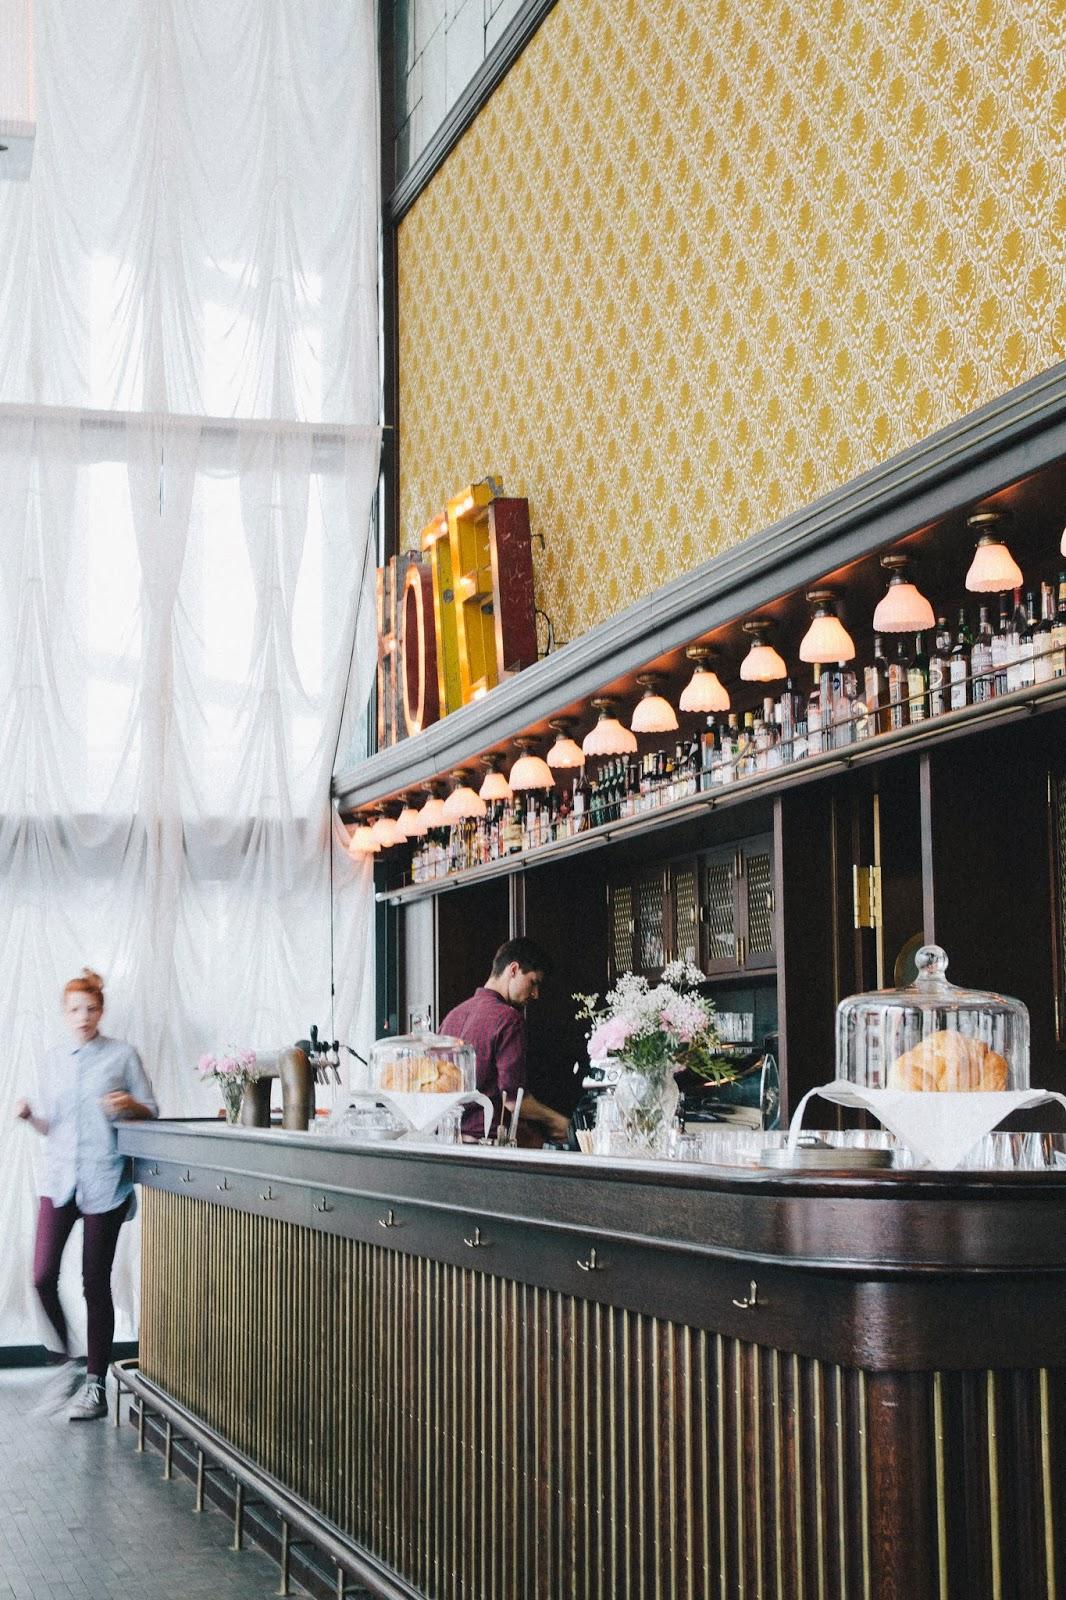 Hotel rivington sons 70percentpure for Home decor zurich